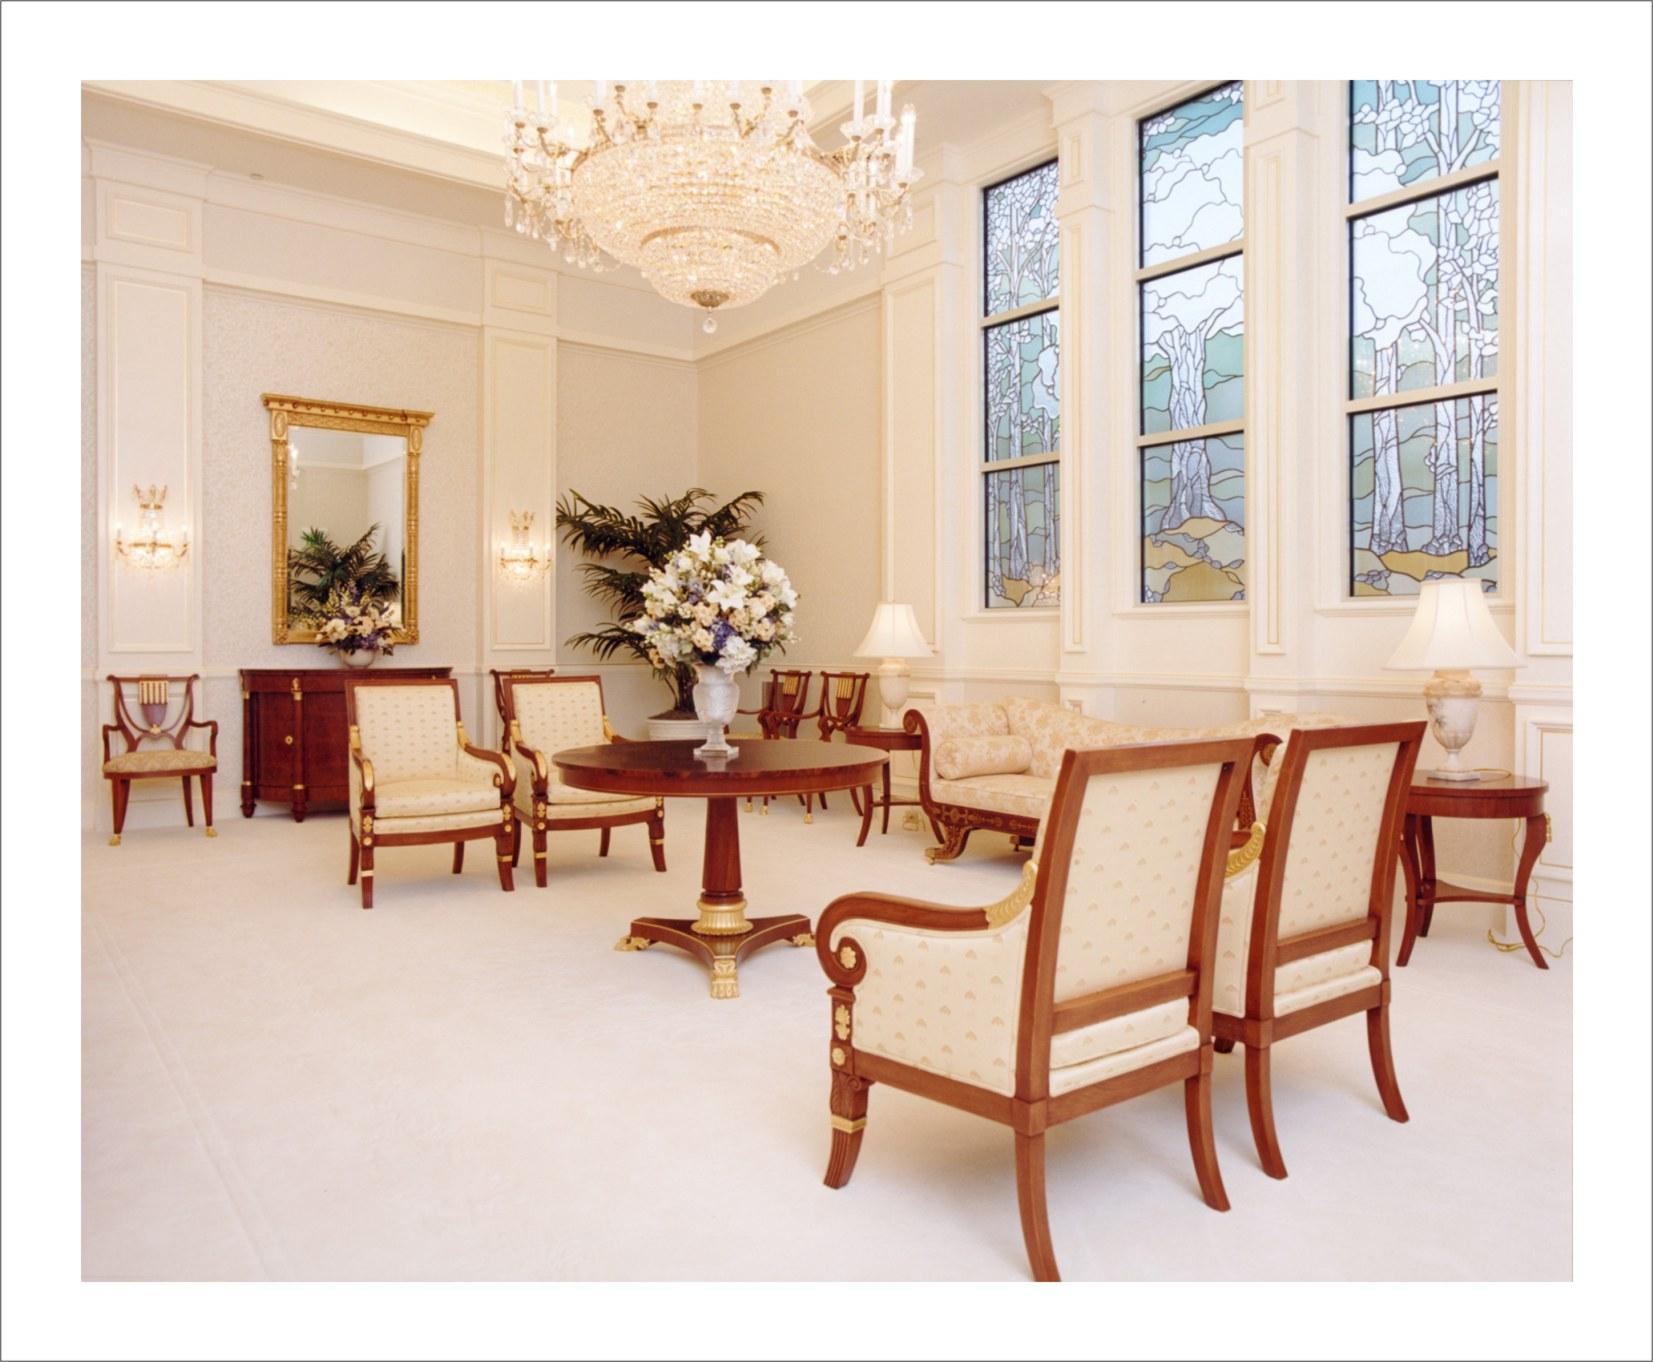 Holdman_Studios_Stained_Art_Glass_LDS_Mormon_Palmyra_New_York_Temple_Sacred_Grove_Tree_of_Life_Windows_Celestial_Room.jpg